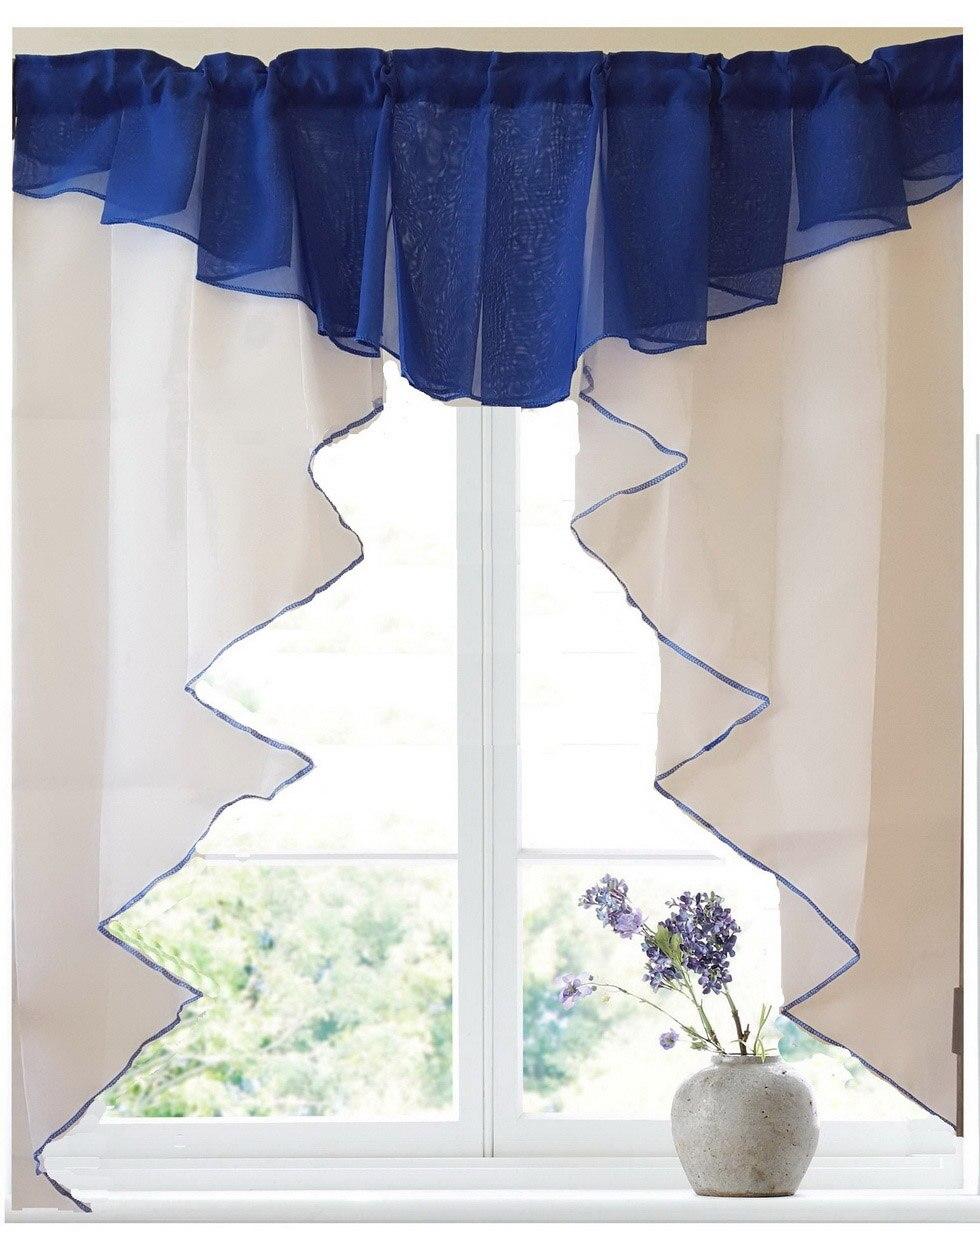 cores design de moda plissada costura cores tule cozinha varanda cortina cortinas romanas pc